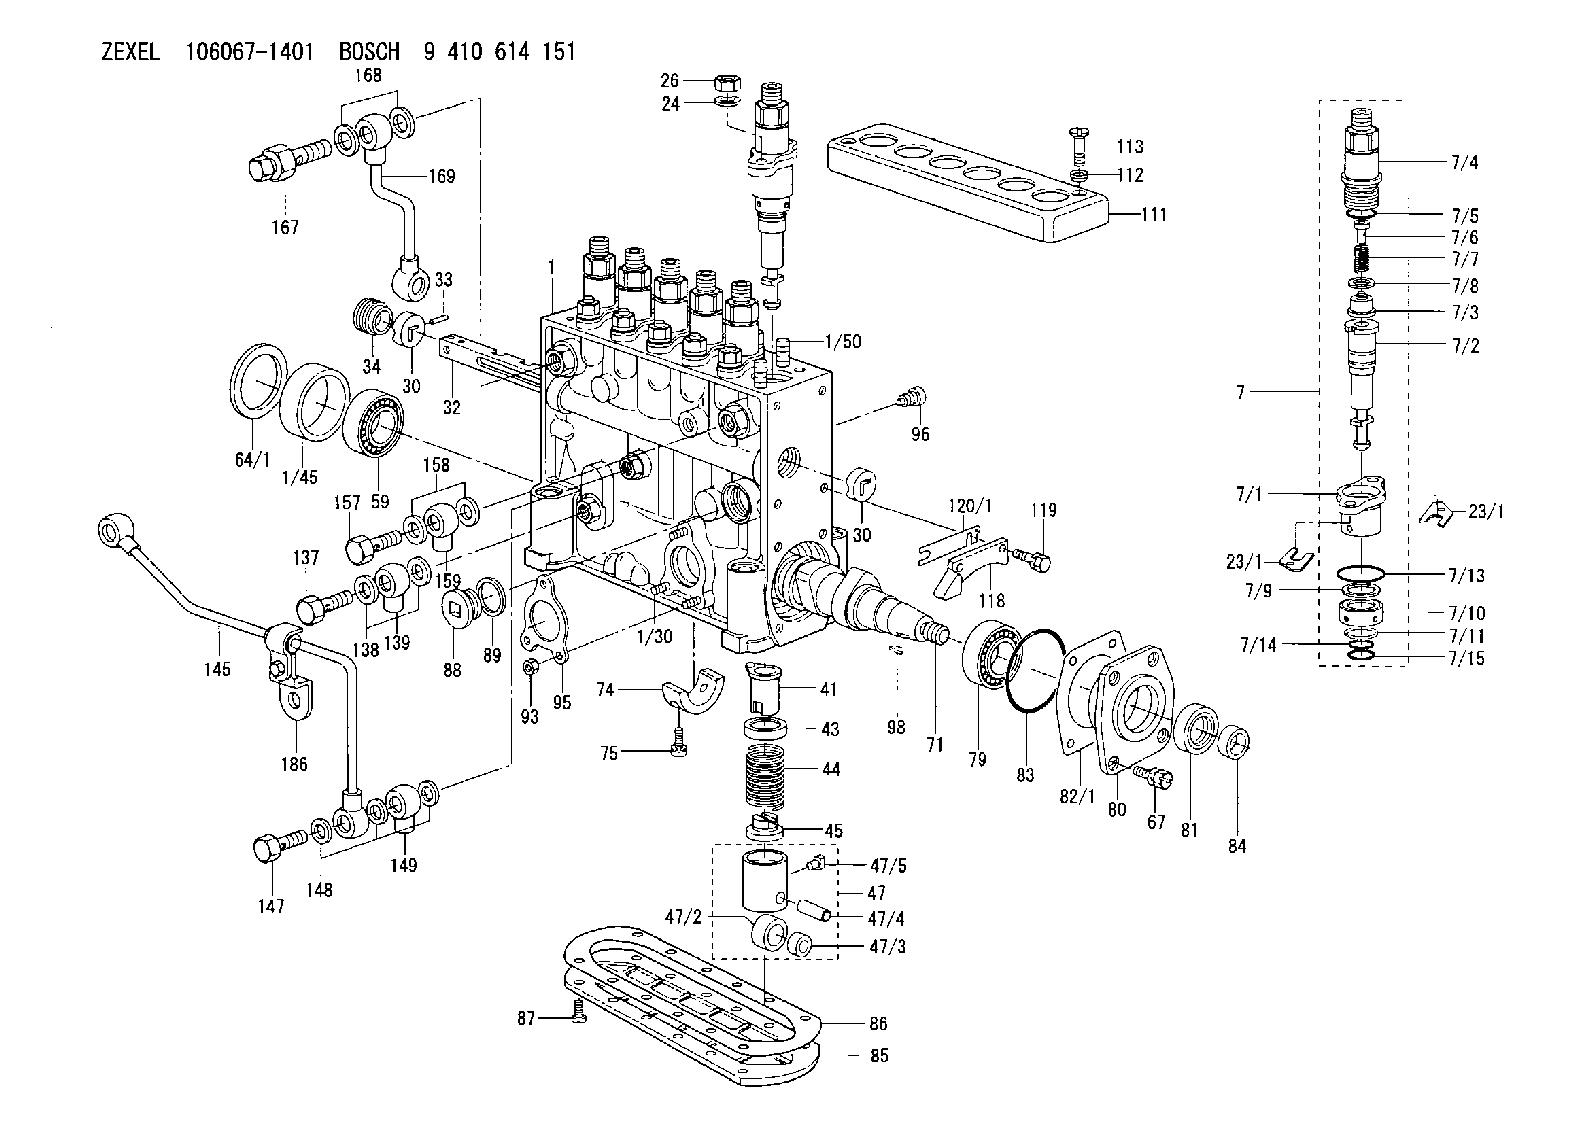 Zexel Injection Pump Wiring Diagram  P7100 Pump Diagram, 2003